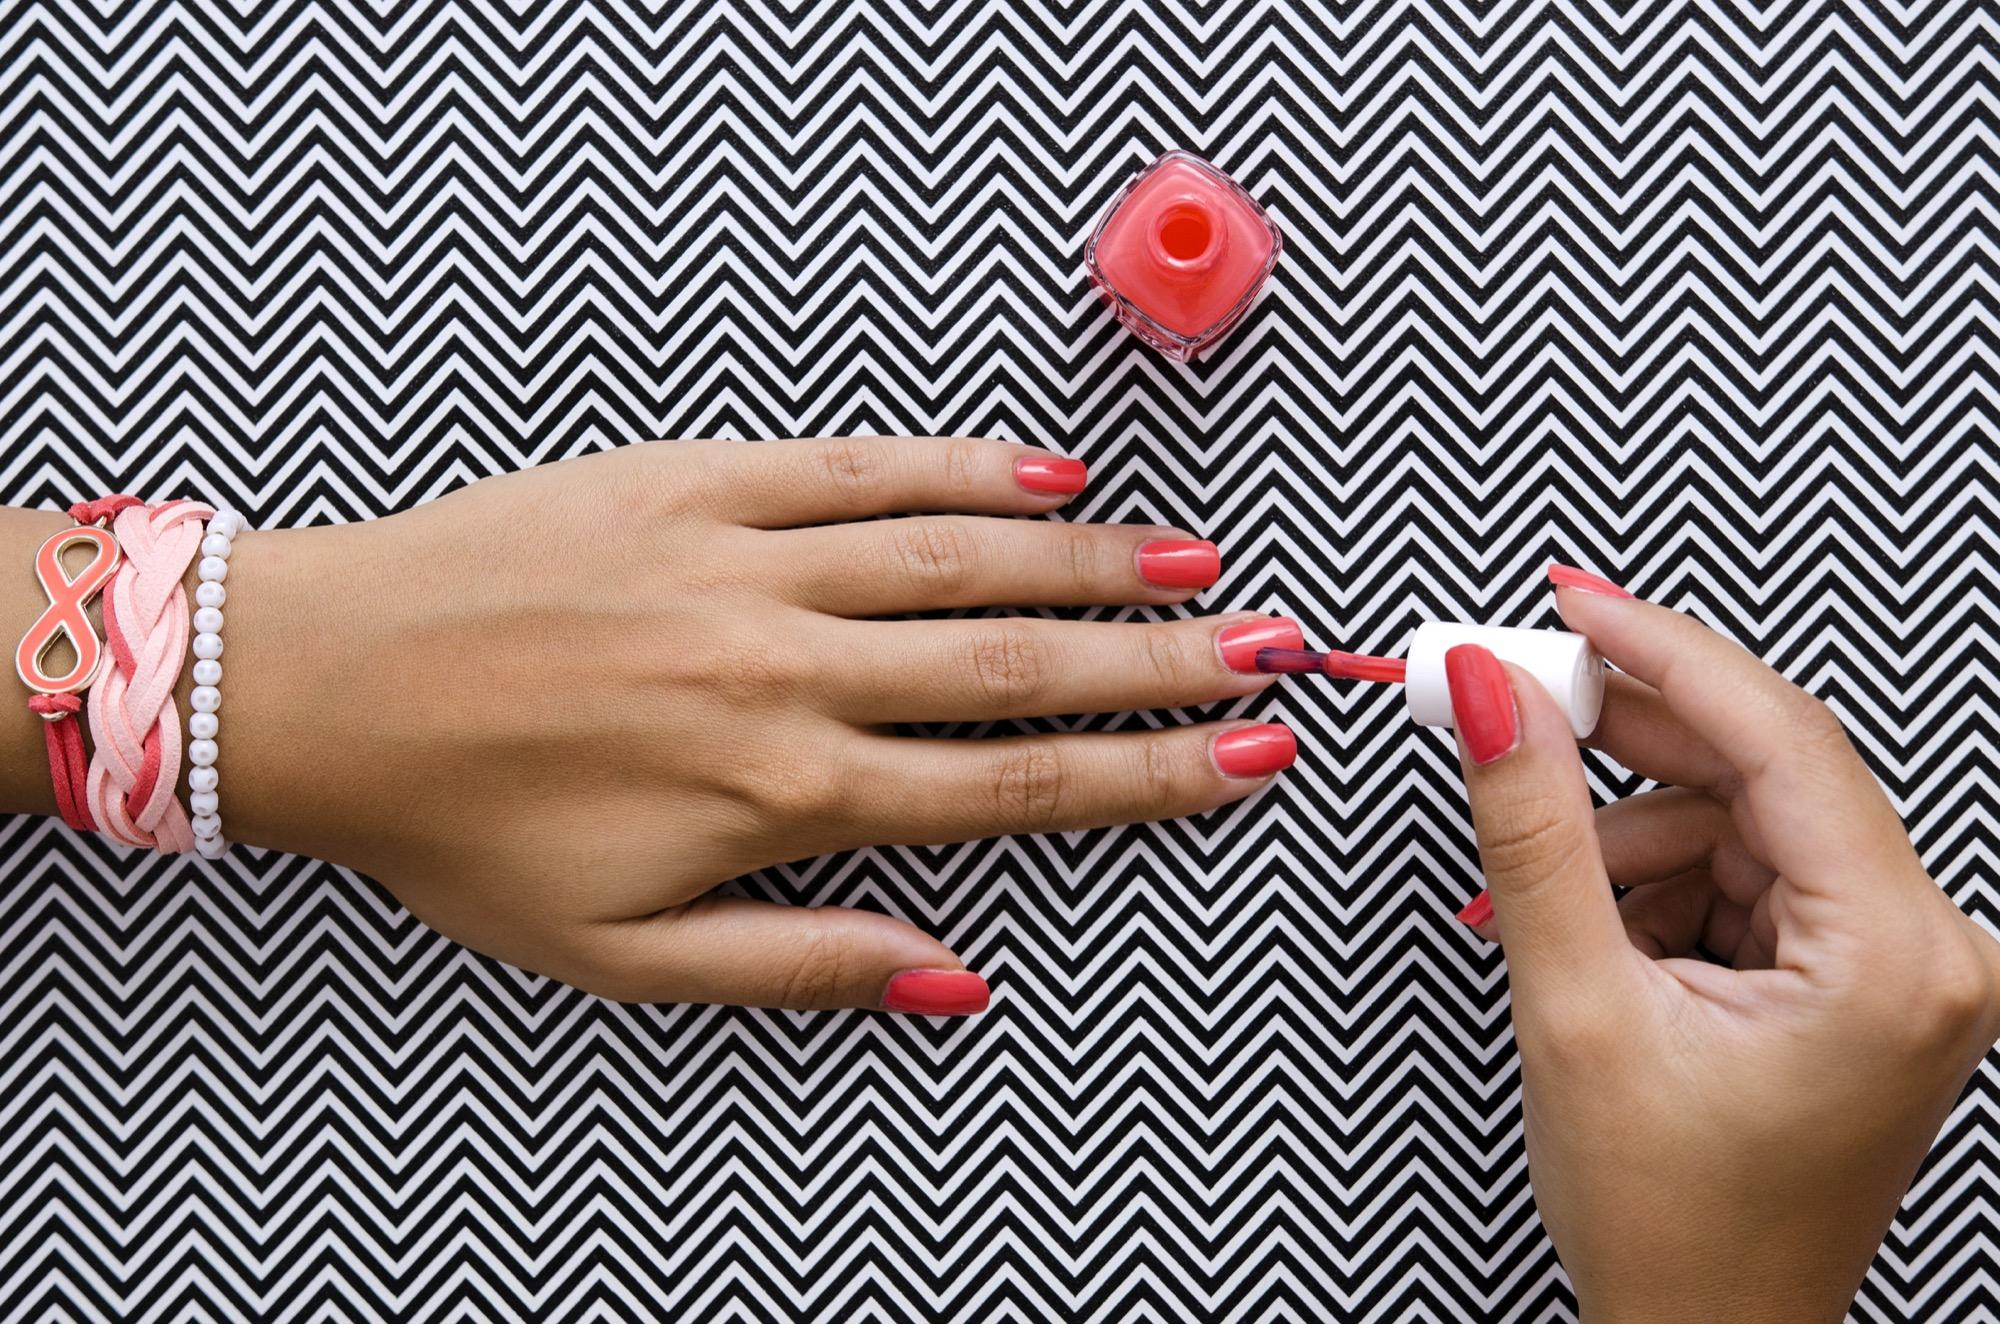 Nagellacktrends – SO lackieren wir unsere Nägel 2017 | BRIGITTE.de